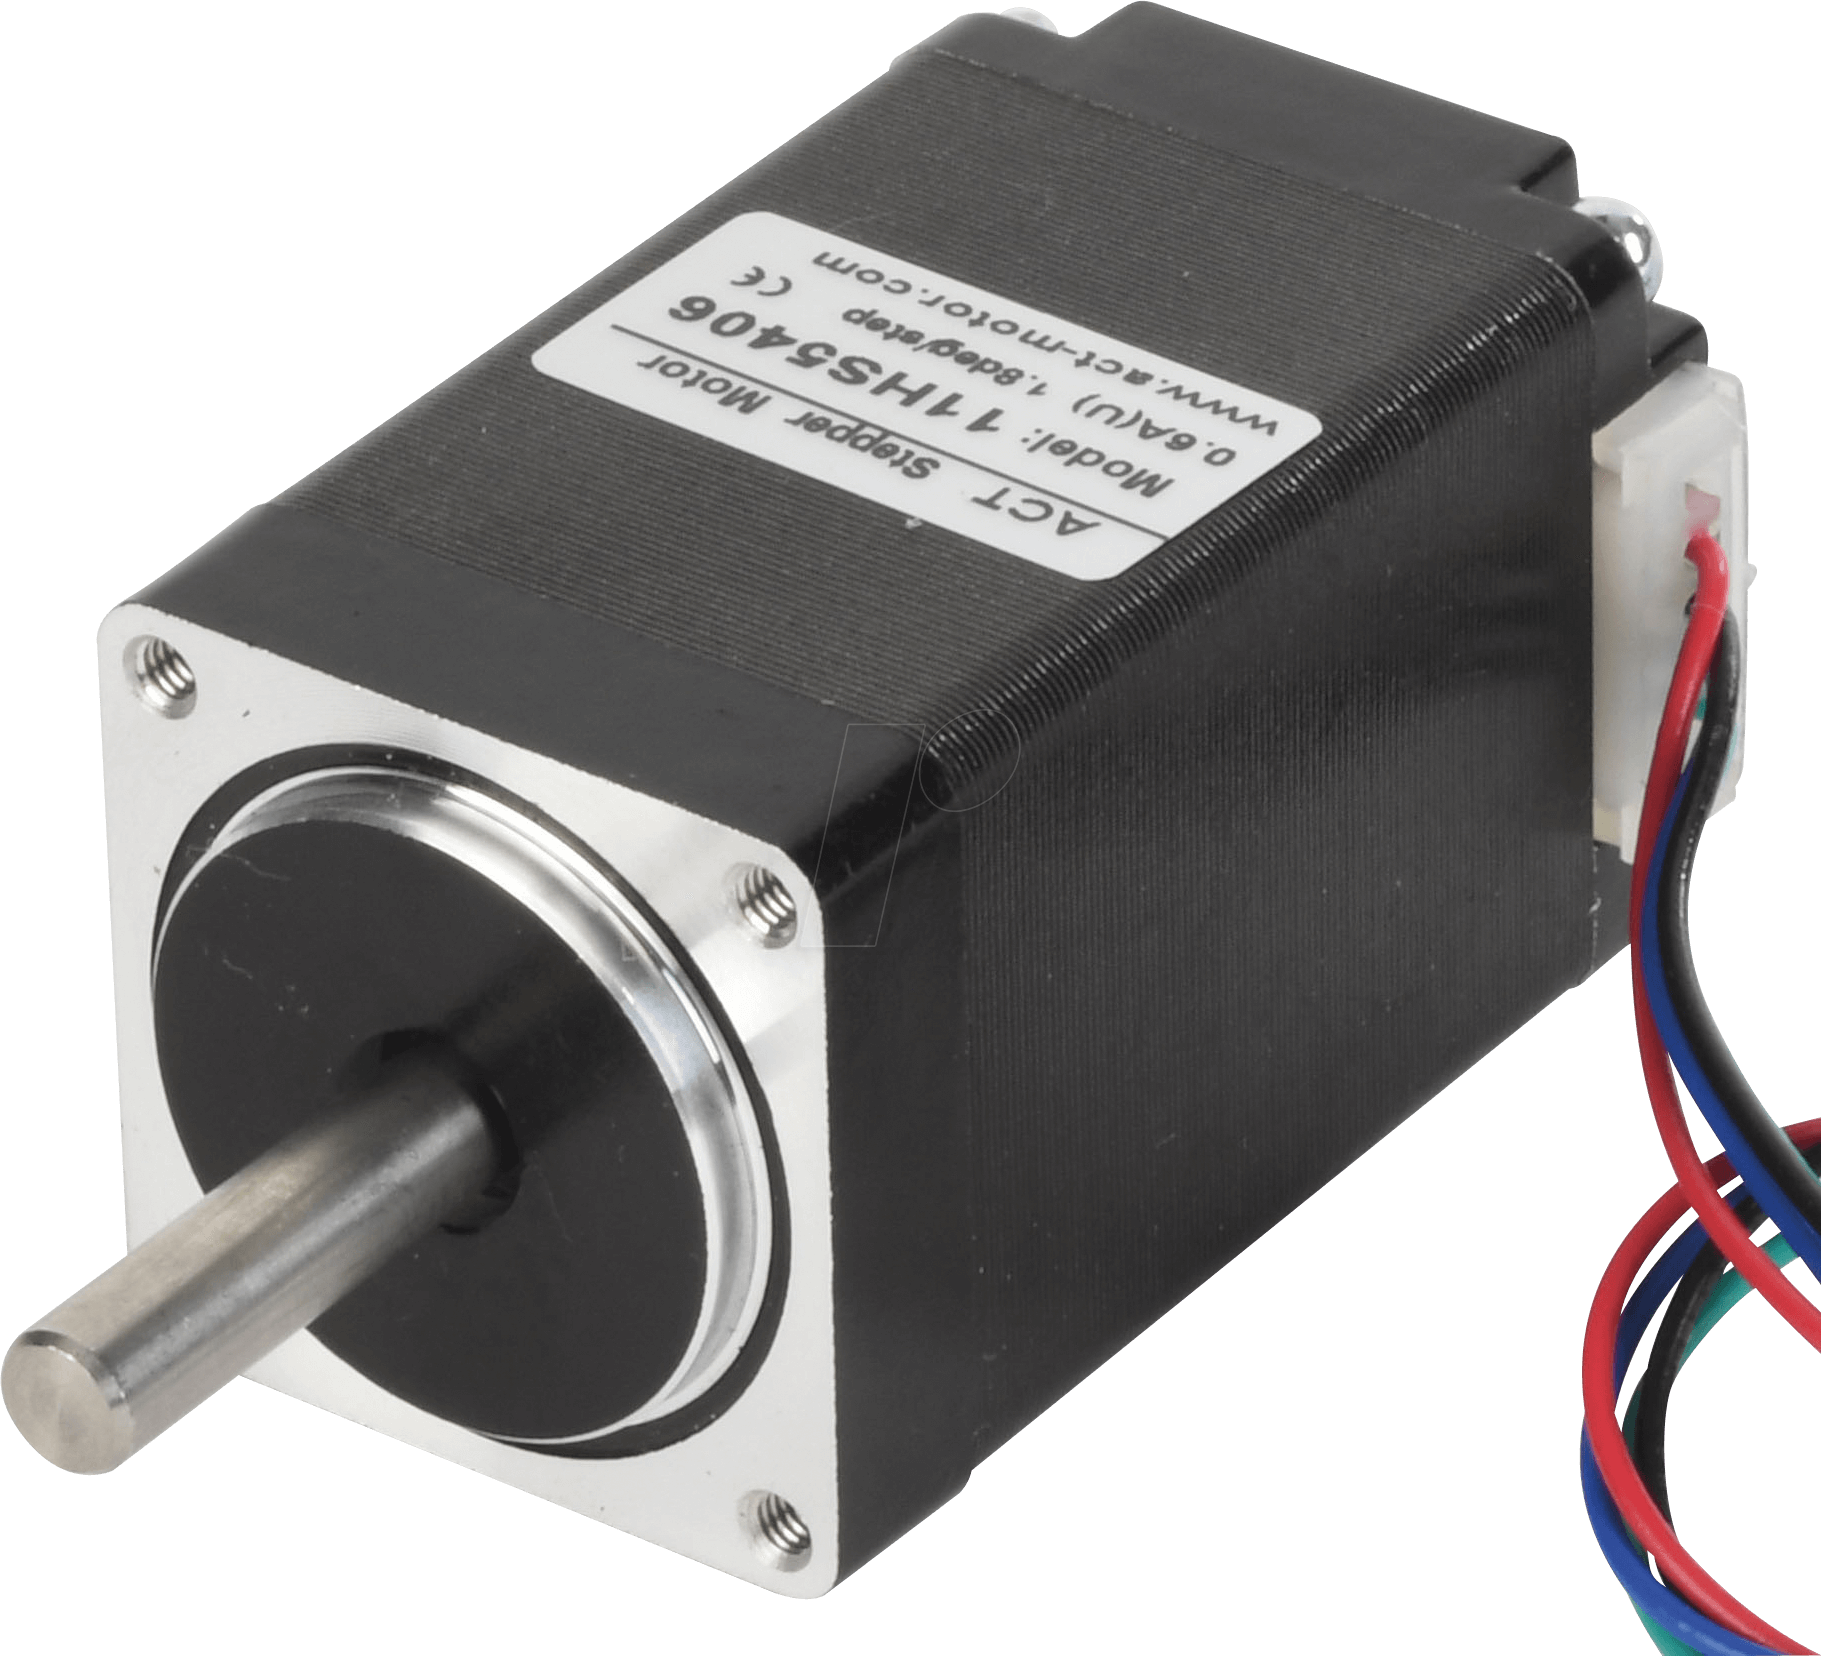 ACT 11HS5406 - Schrittmotor, 4 pol, 1,8 °, 6,2 V DC